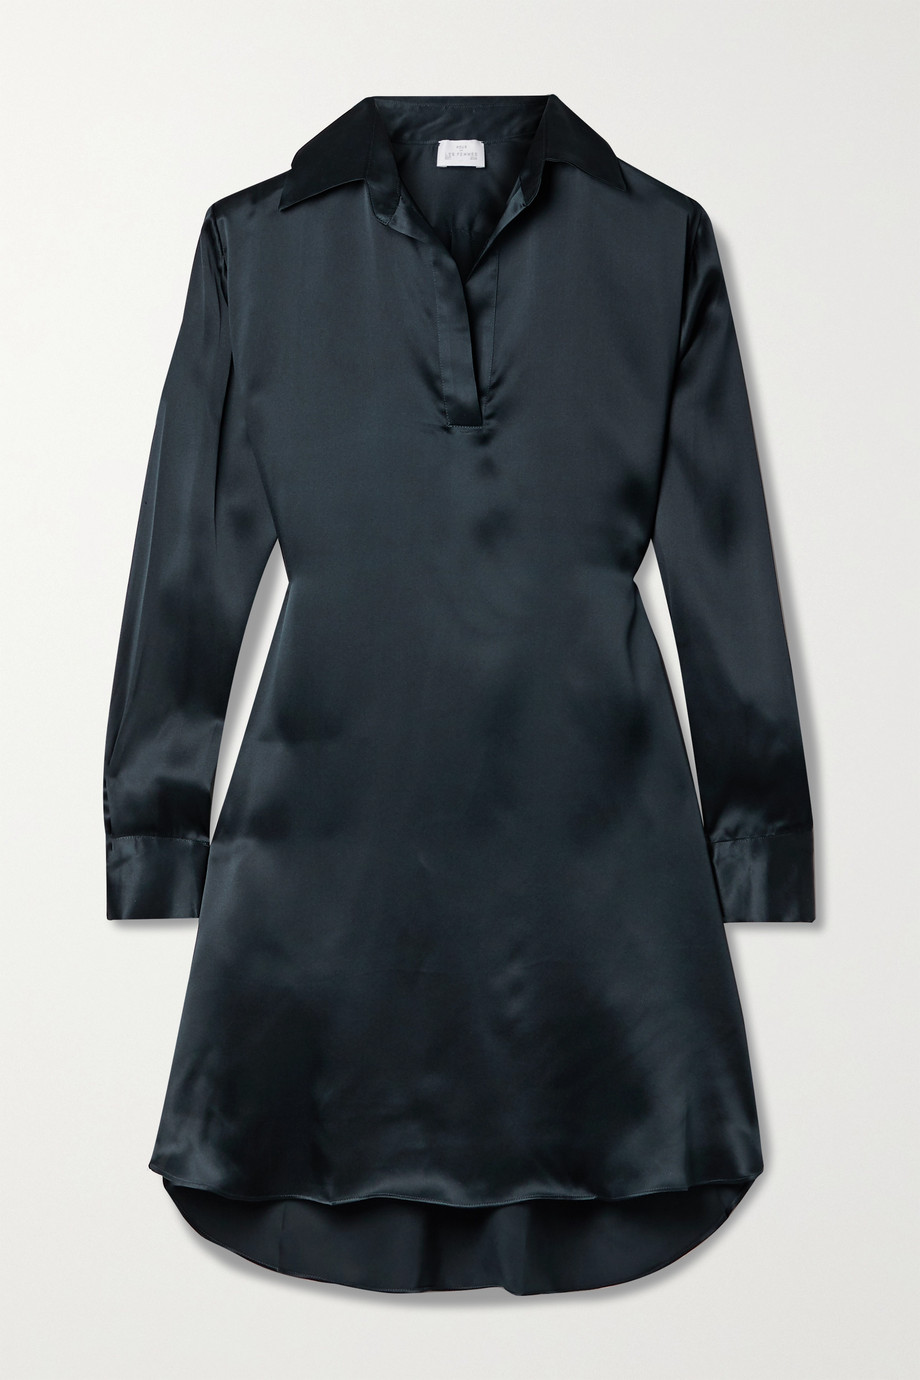 Pour Les Femmes Mini-Hemdblusenkleid aus Seiden-Charmeuse